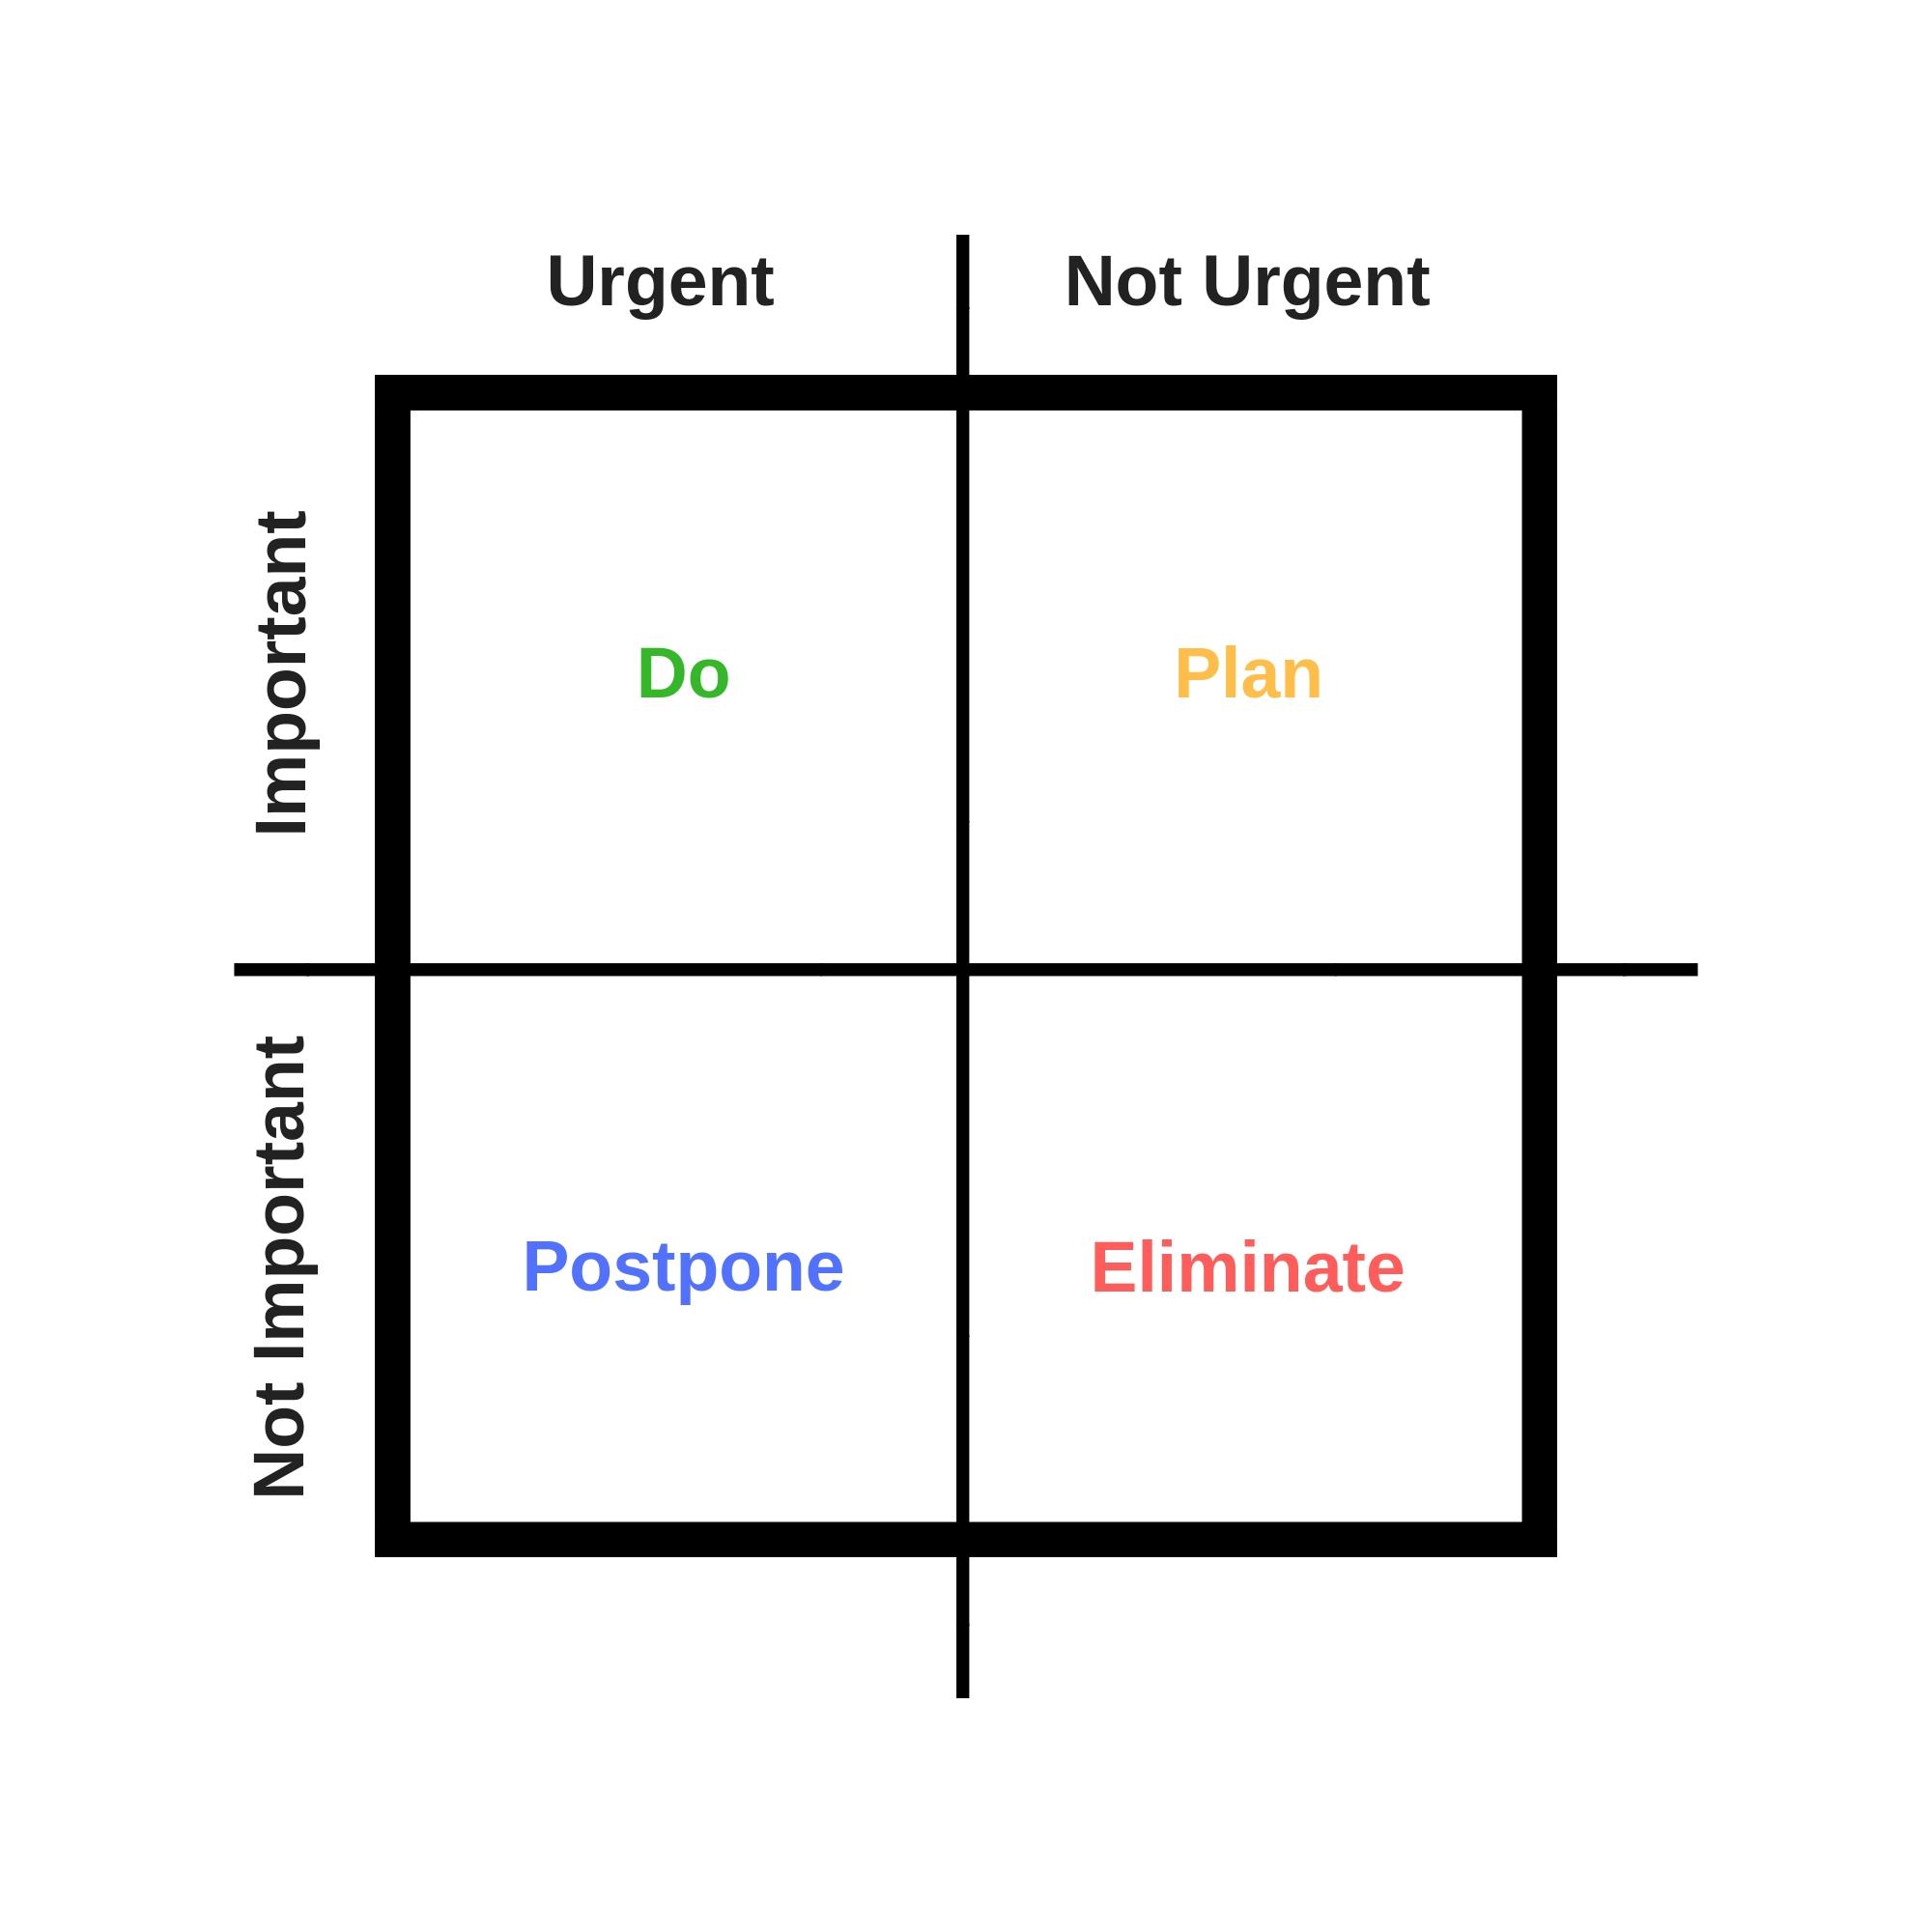 Can The Eisenhower Matrix Make You Work Smarter